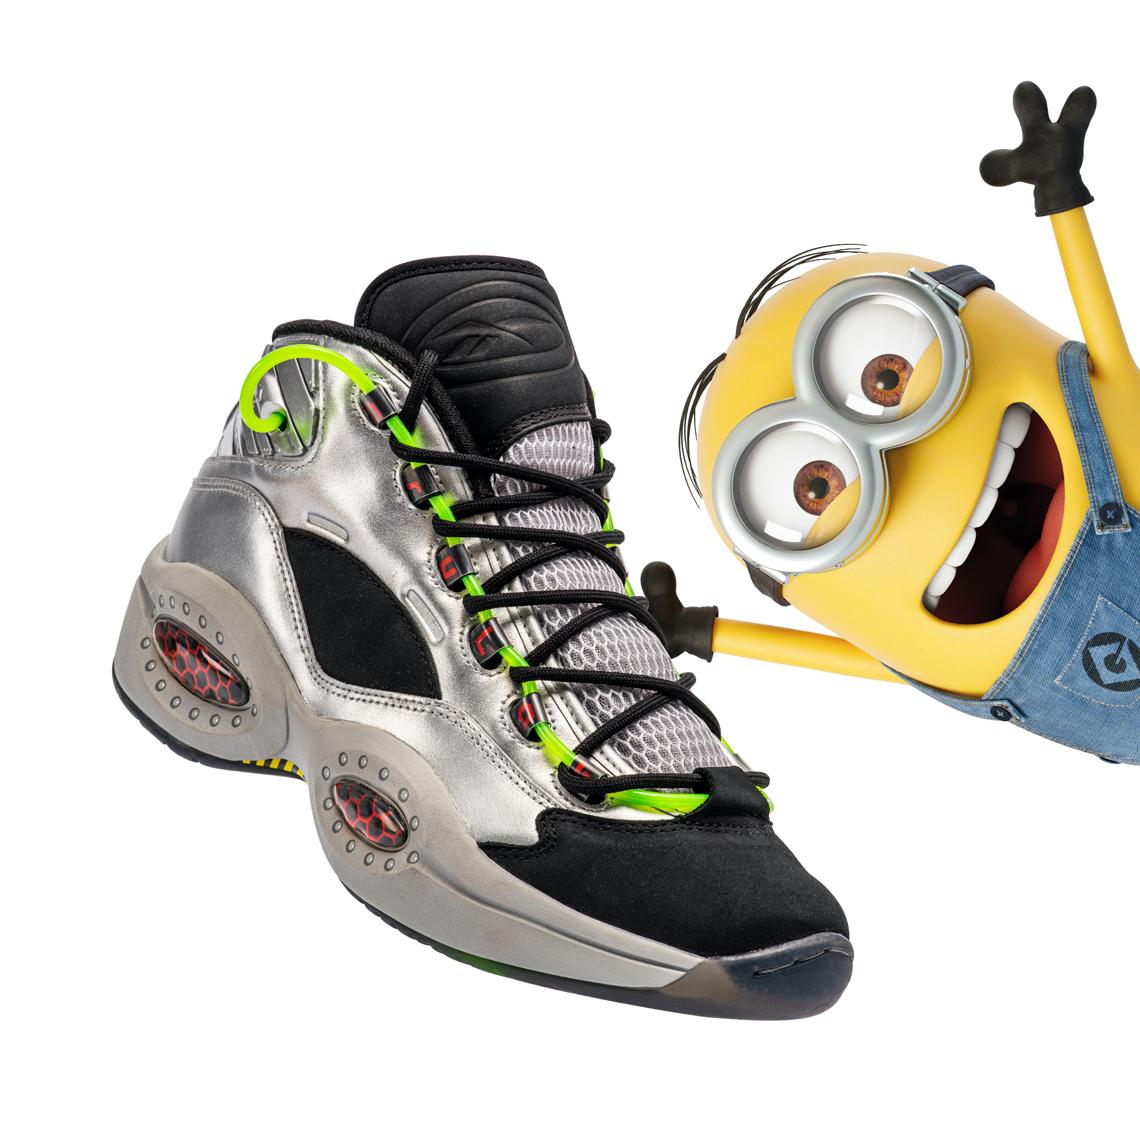 giày thể thao 1-8.10.2020-minions-reebok-instapump-fury1 (8)